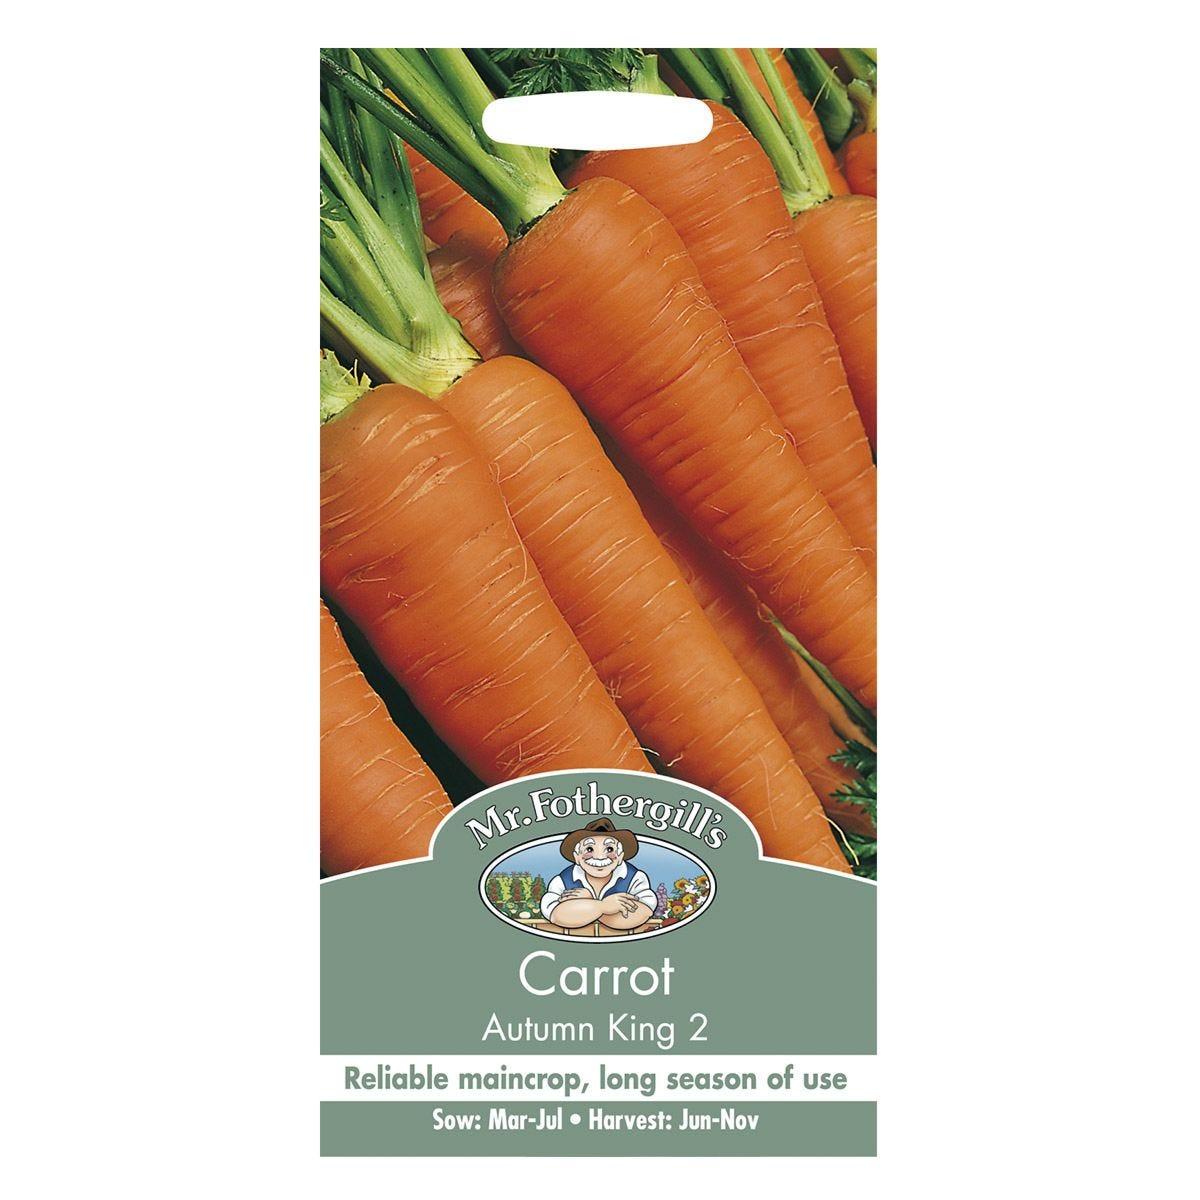 Mr Fothergill's Carrot Autumn King 2 Seeds